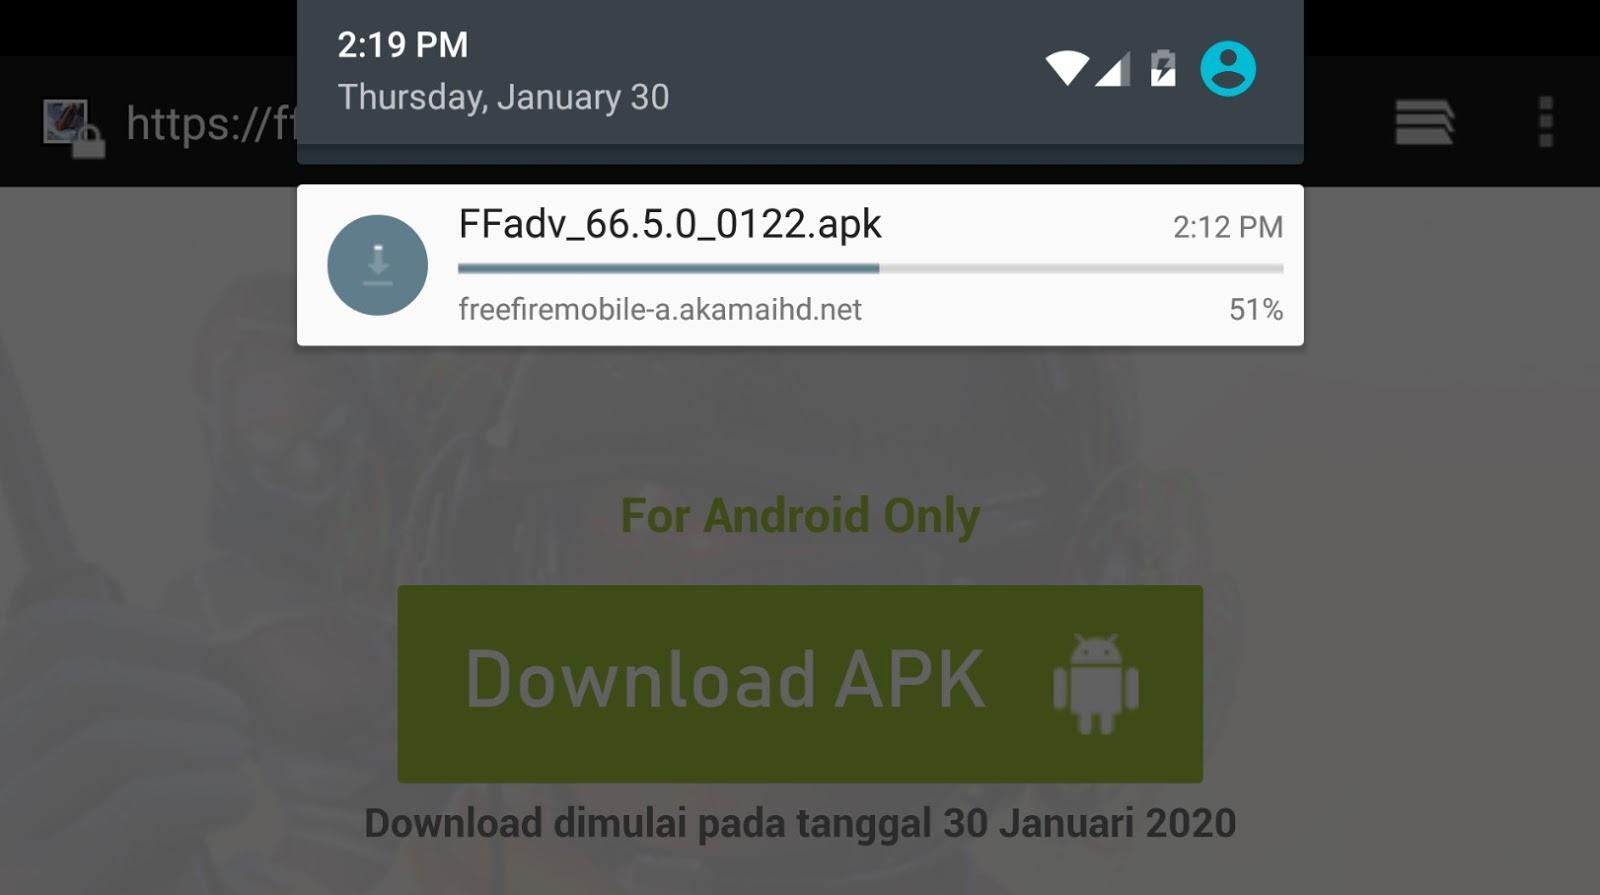 Download Advance Server Free Fire Version 66 5 0 022 Apk Februari 2020 Retuwit